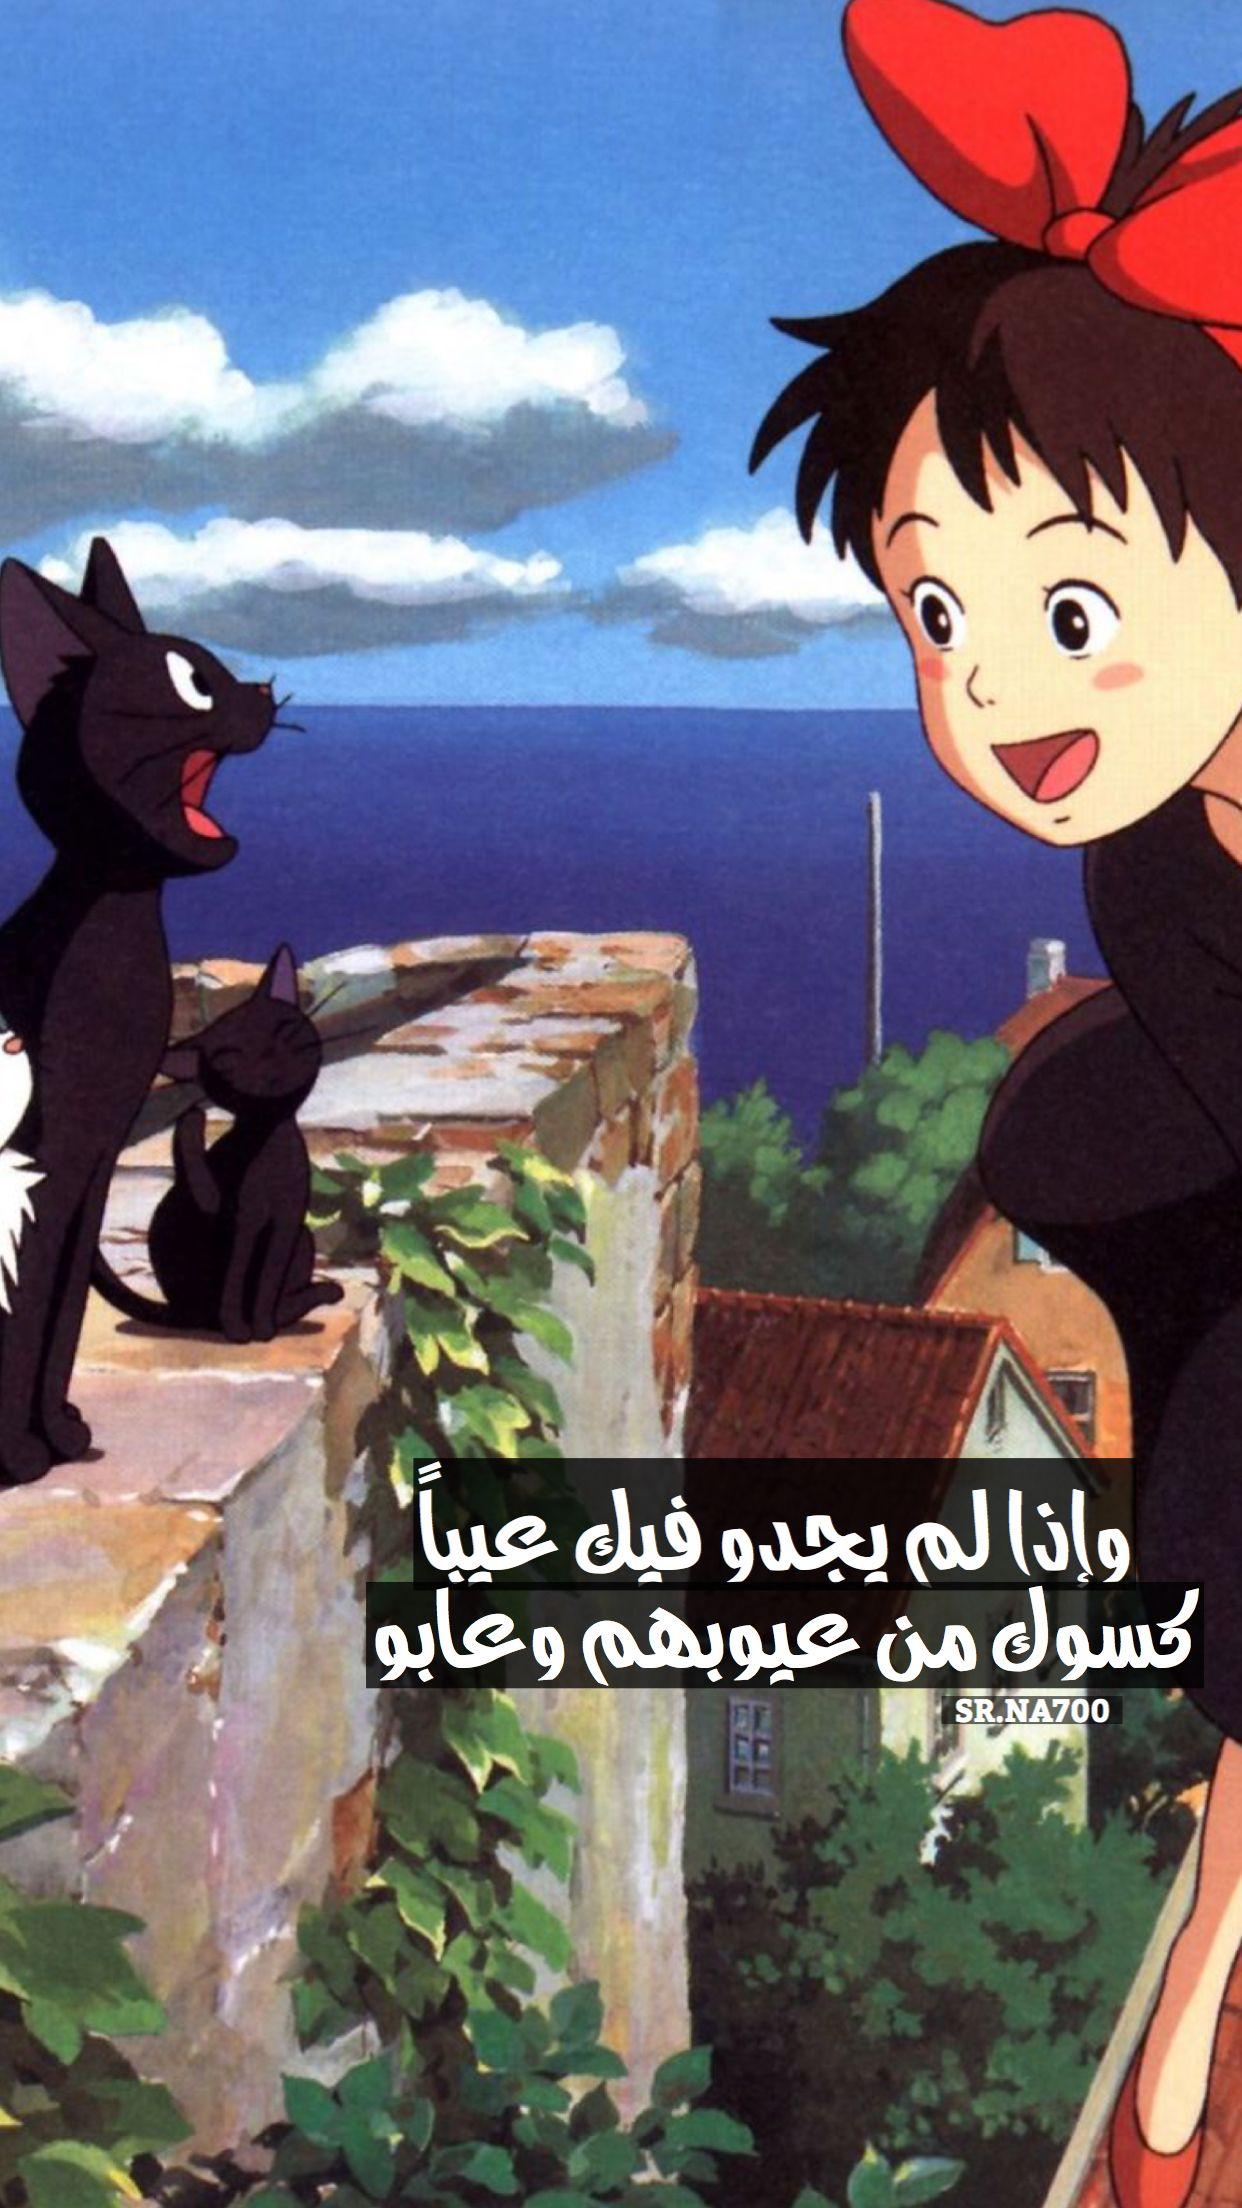 Animax Cartoon Wallpaper pin#خلك_إيجابي 😃✨ نايف العيسي on ايجابي متفائل تفائل